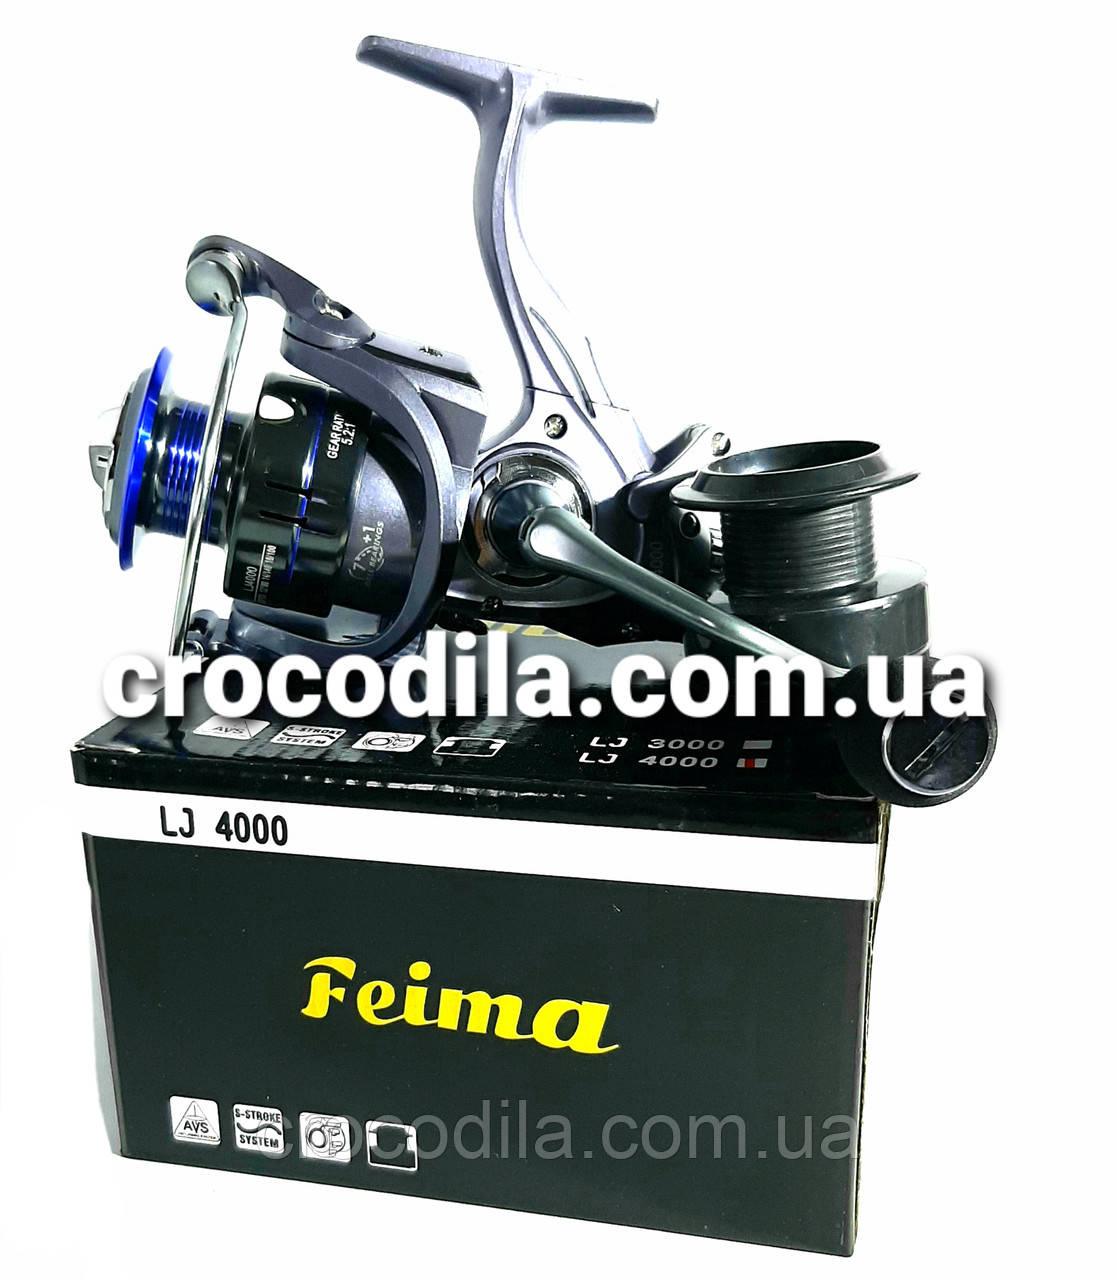 Карповая катушка с бейтранером Feima LJ 5000